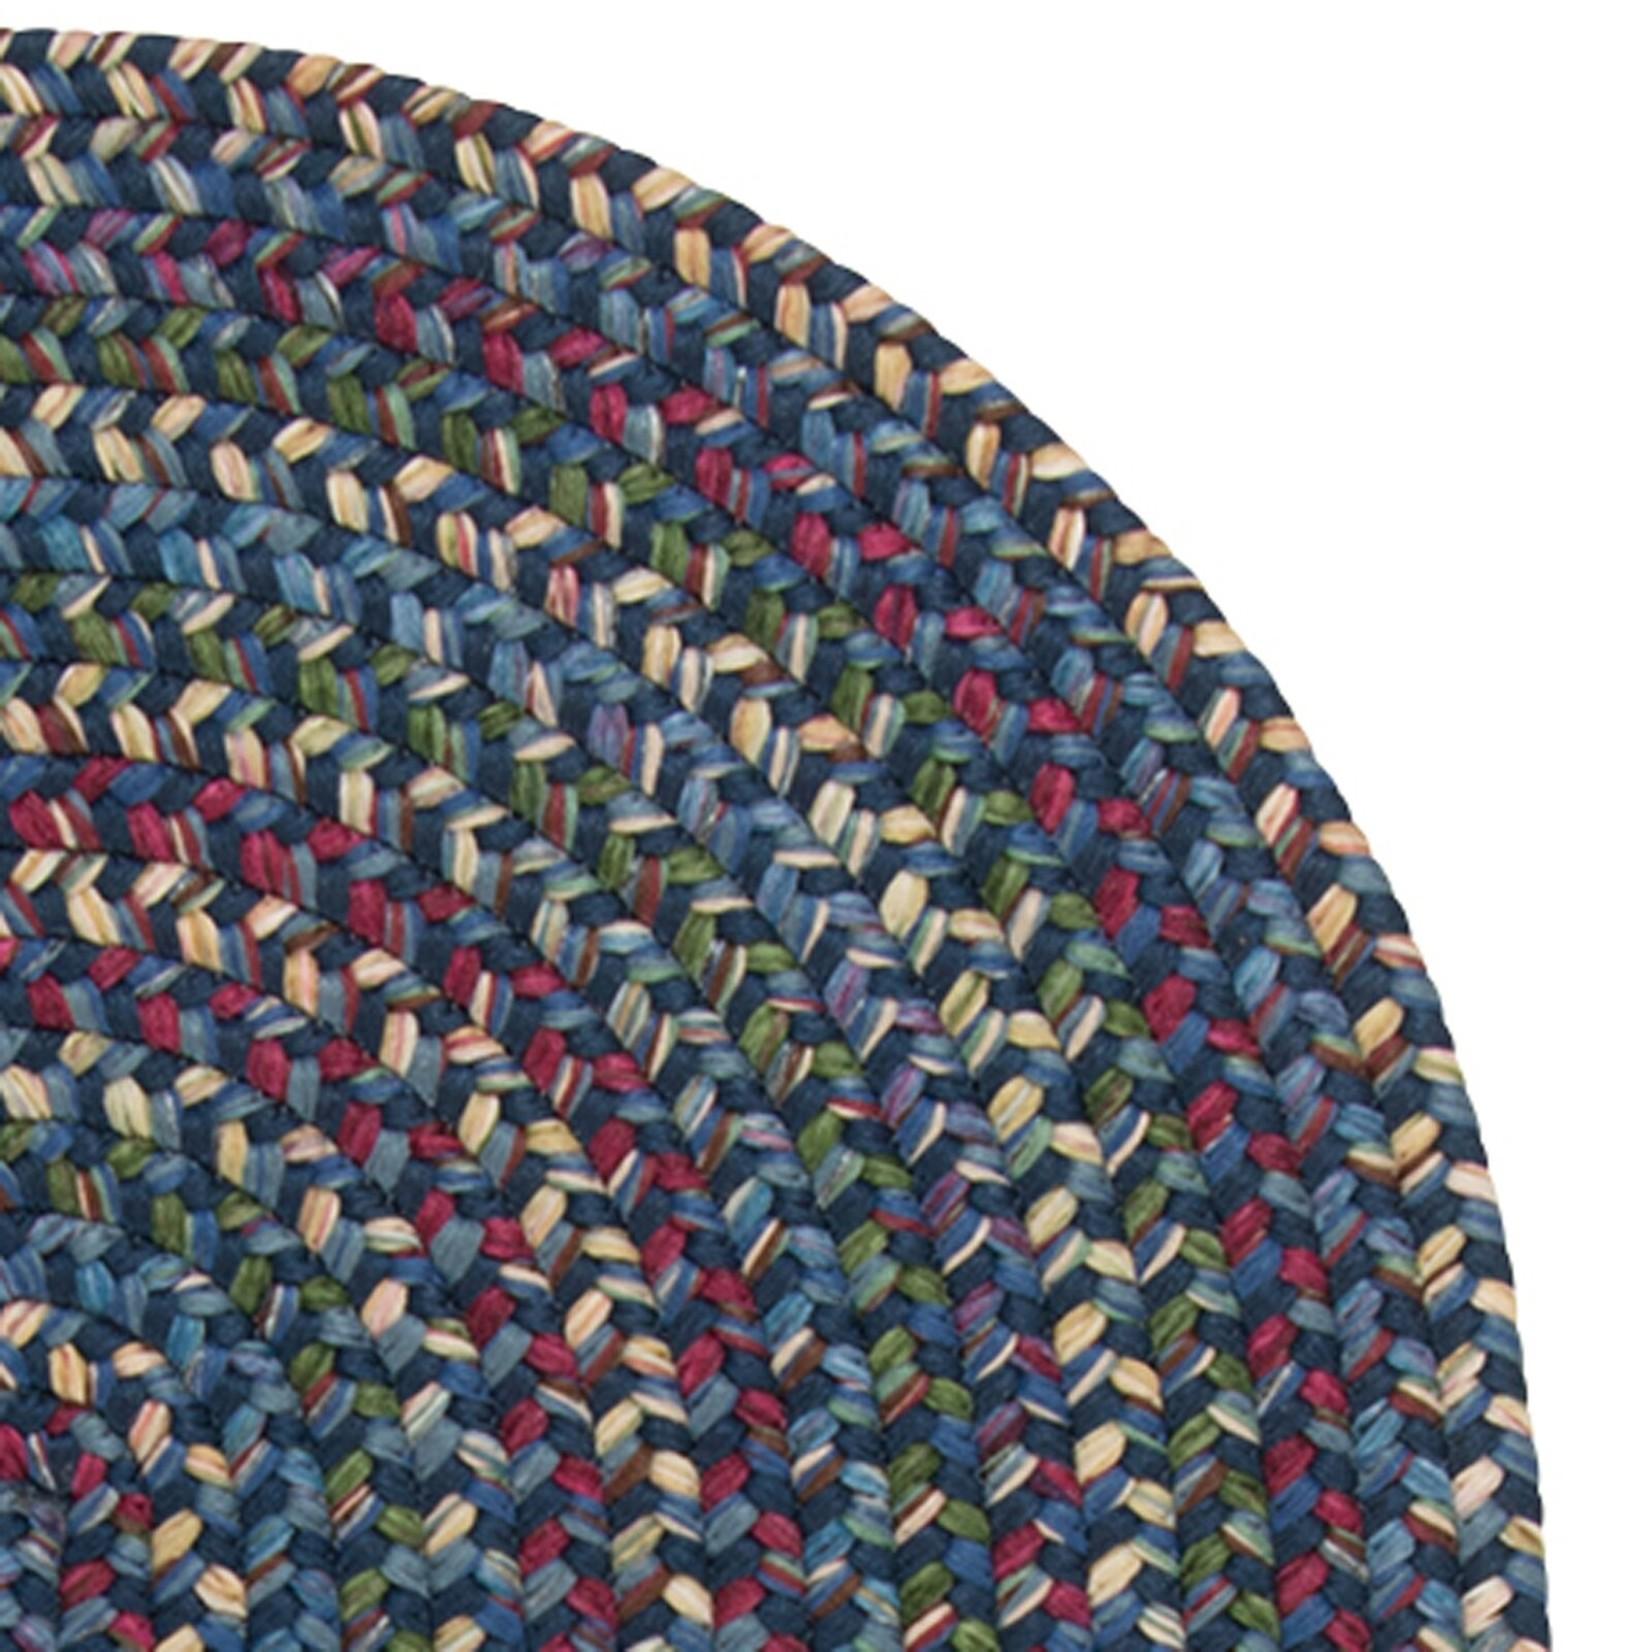 *2' x 4 Oval - Dollman Braided Navy/Green Rug